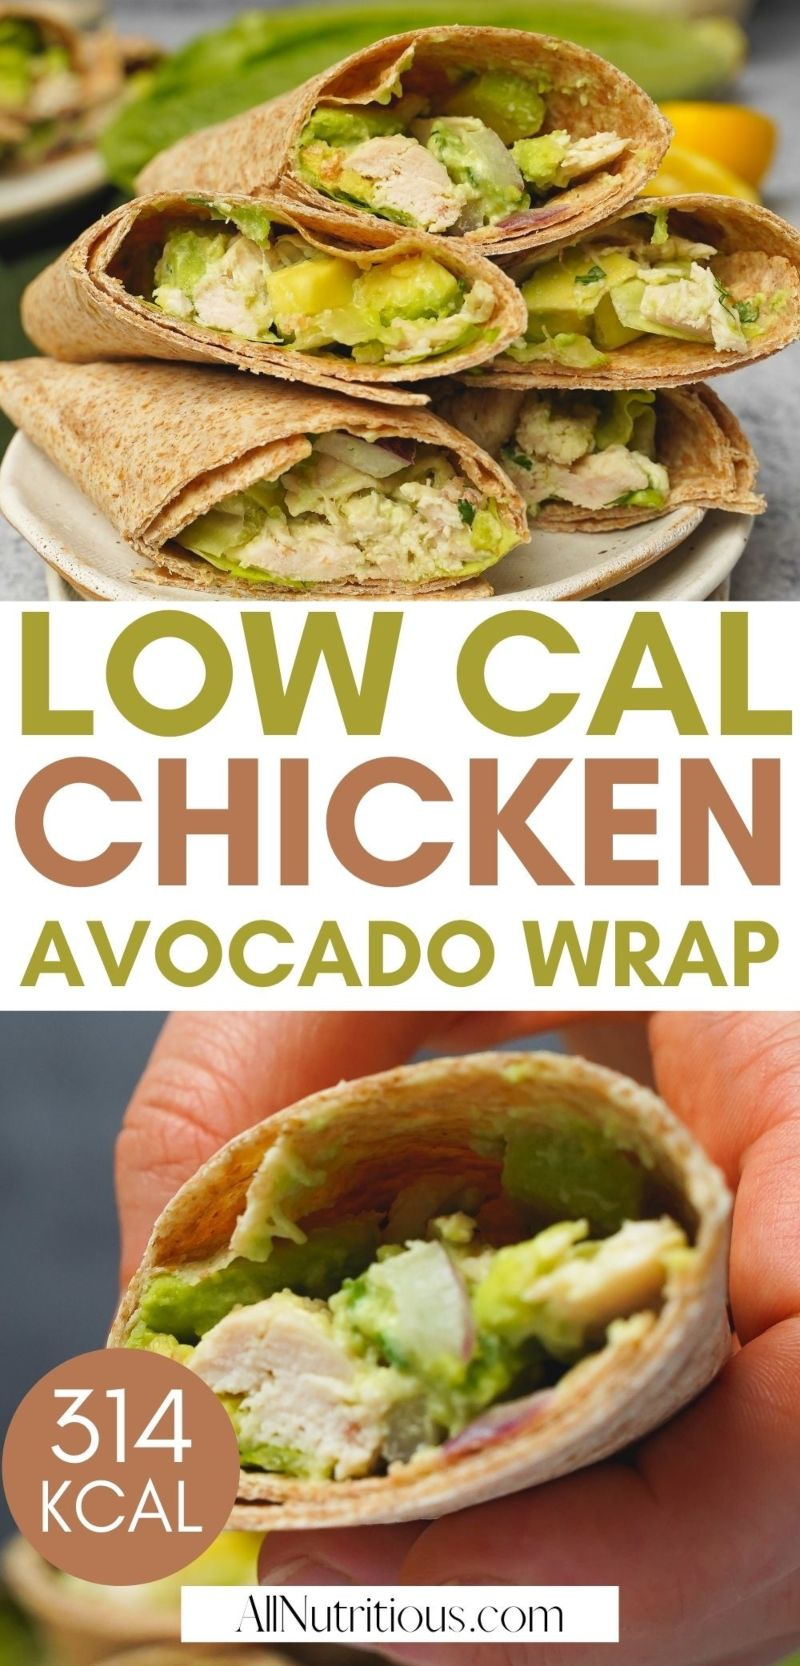 low cal chicken avocado wrap